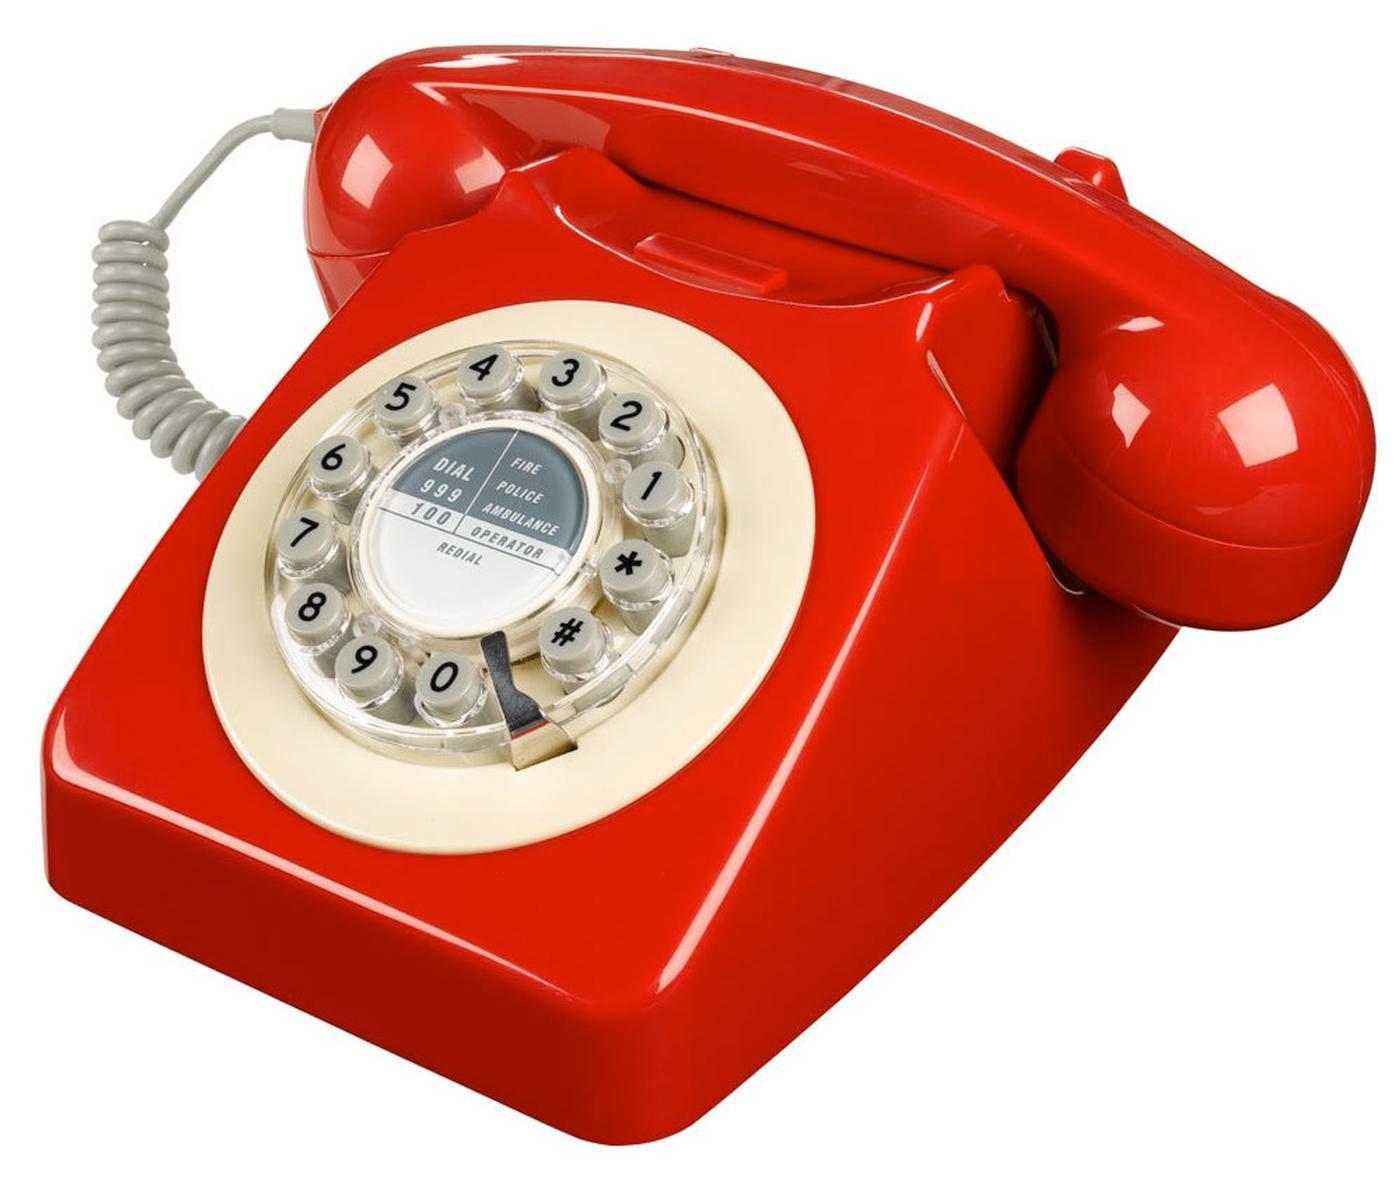 746 Retro Sixties Mod British Telephone Pbr